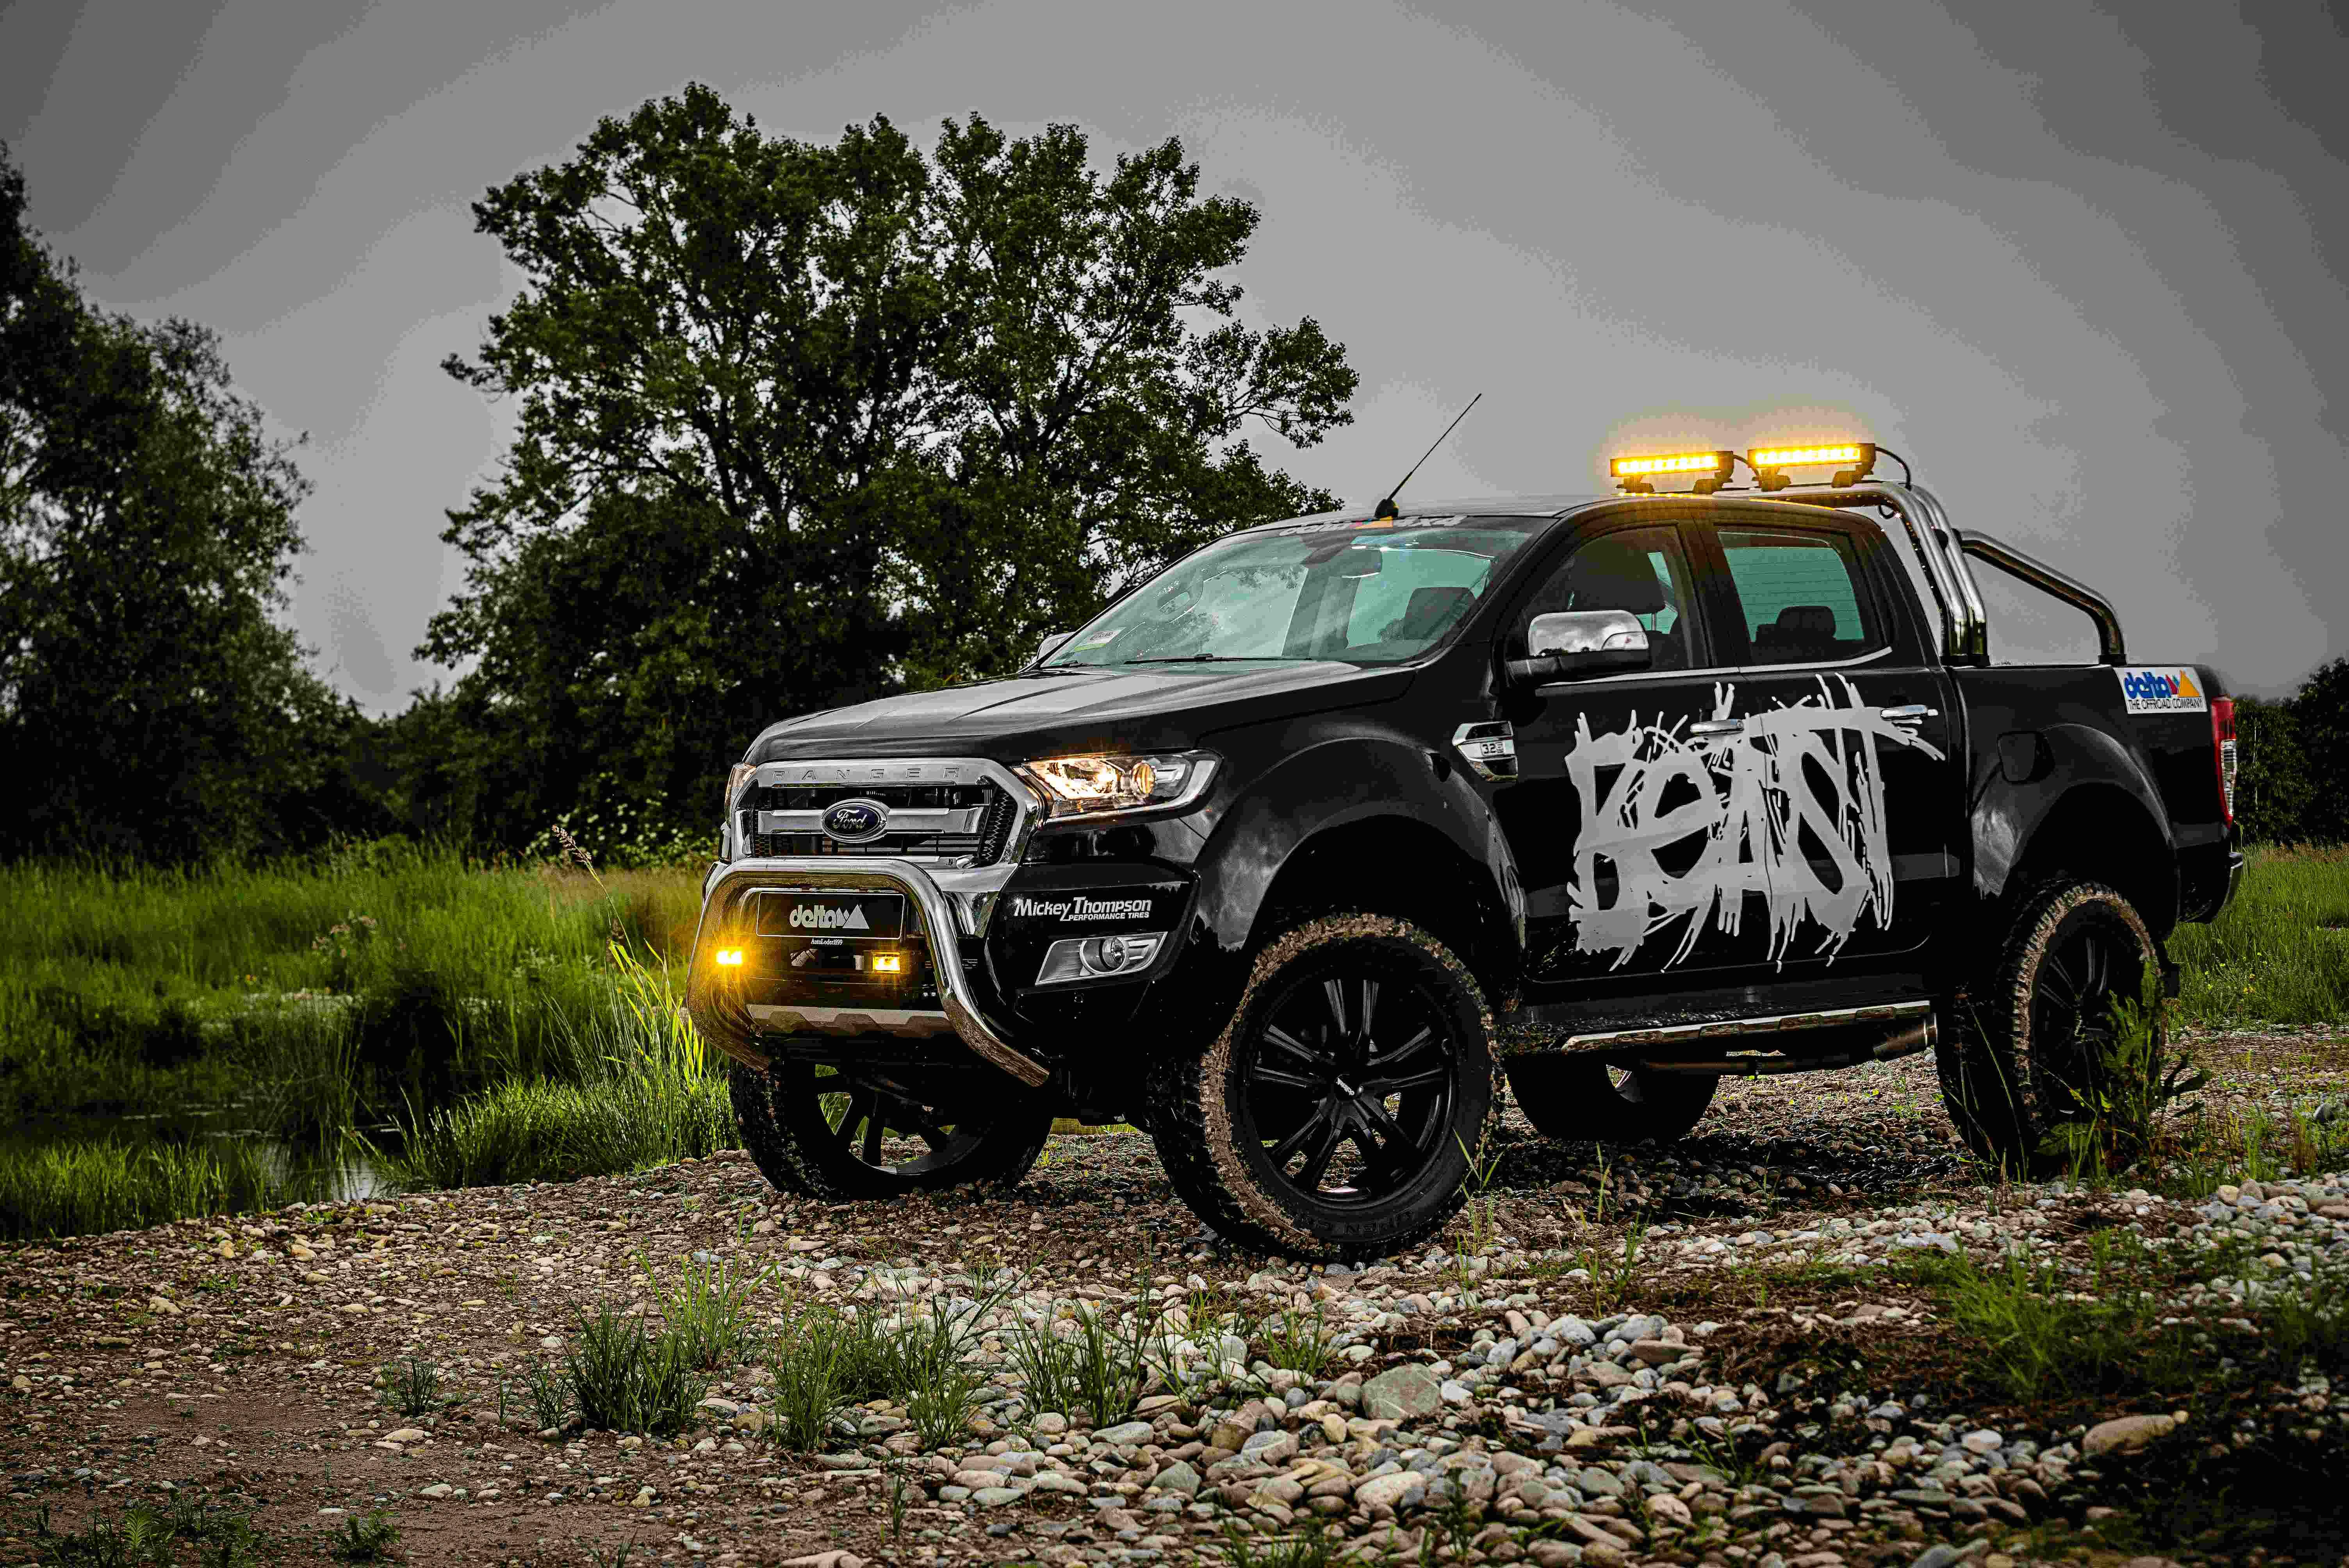 Ford Ranger The Beast Uitvoering Saris4x4